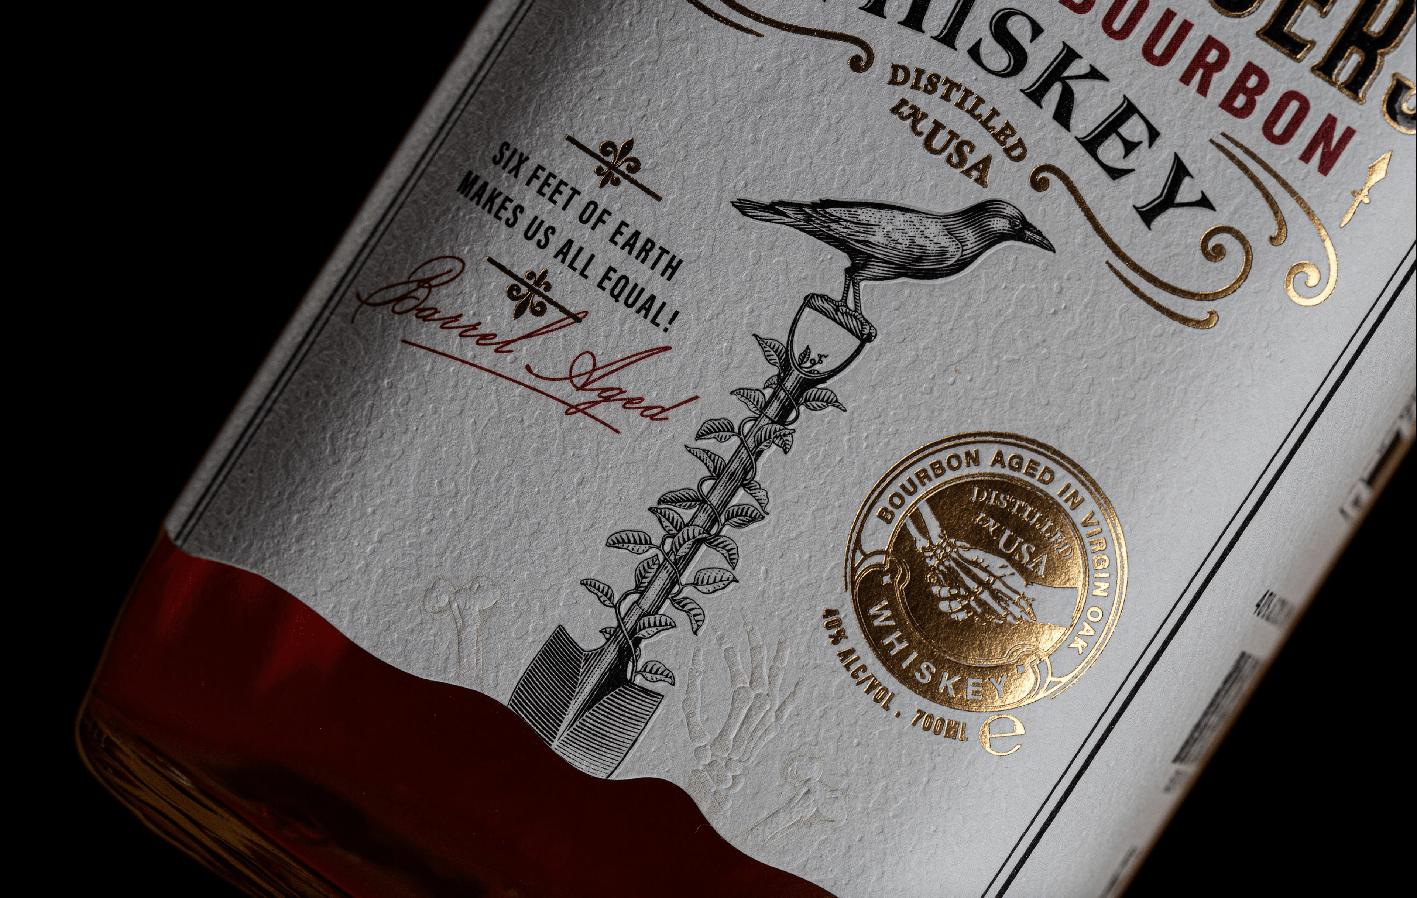 ThinkBold! Create Gravediggers Kentucky Bourbon Packaging Label Design